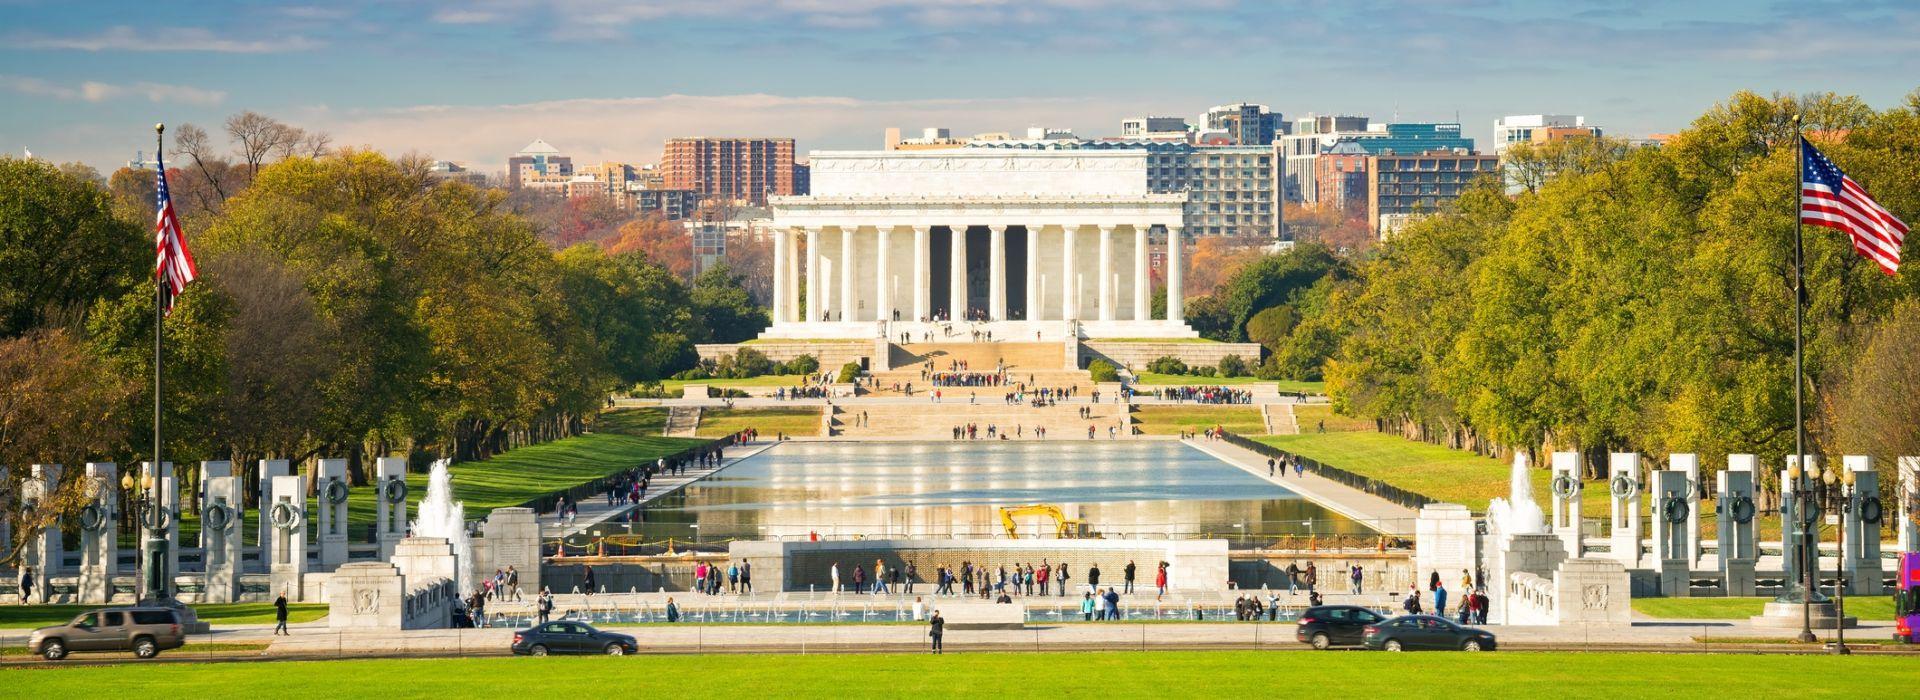 City sightseeing Tours in Atlanta